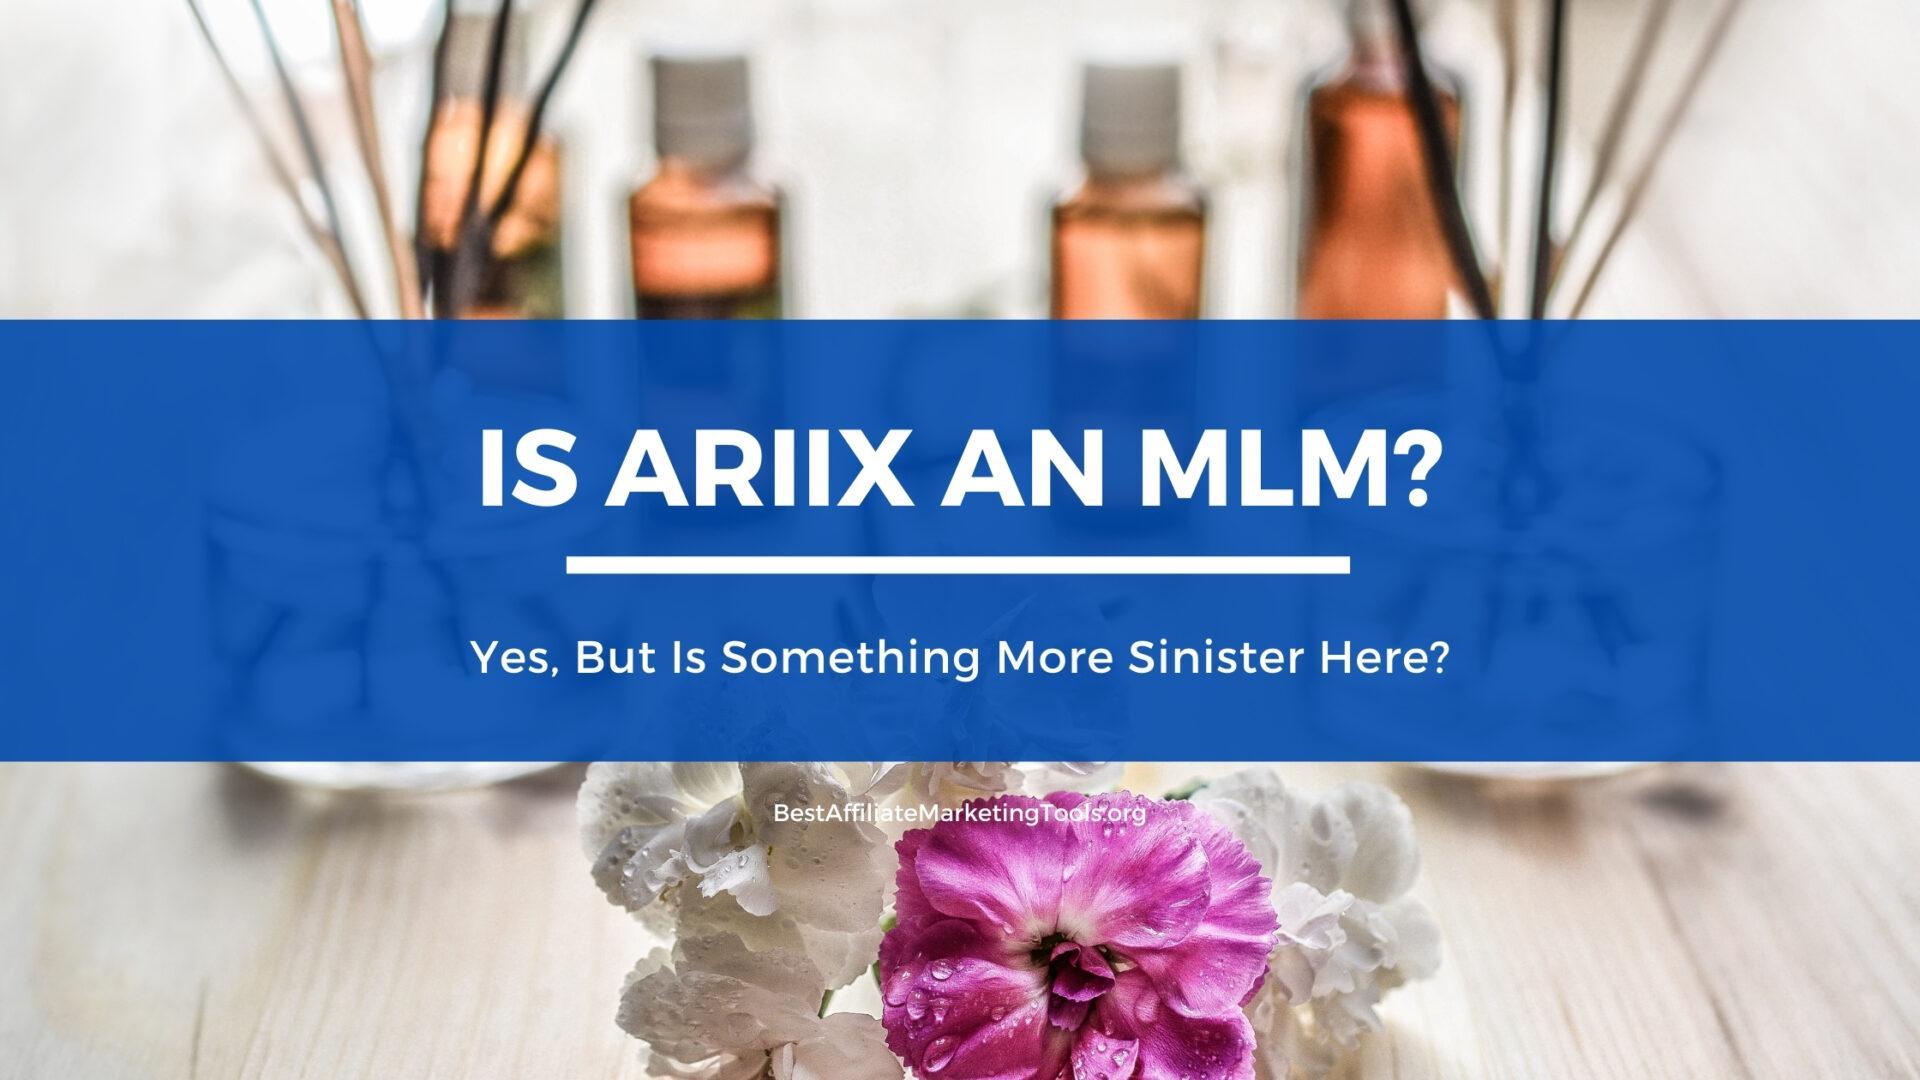 Is Ariix an Mlm